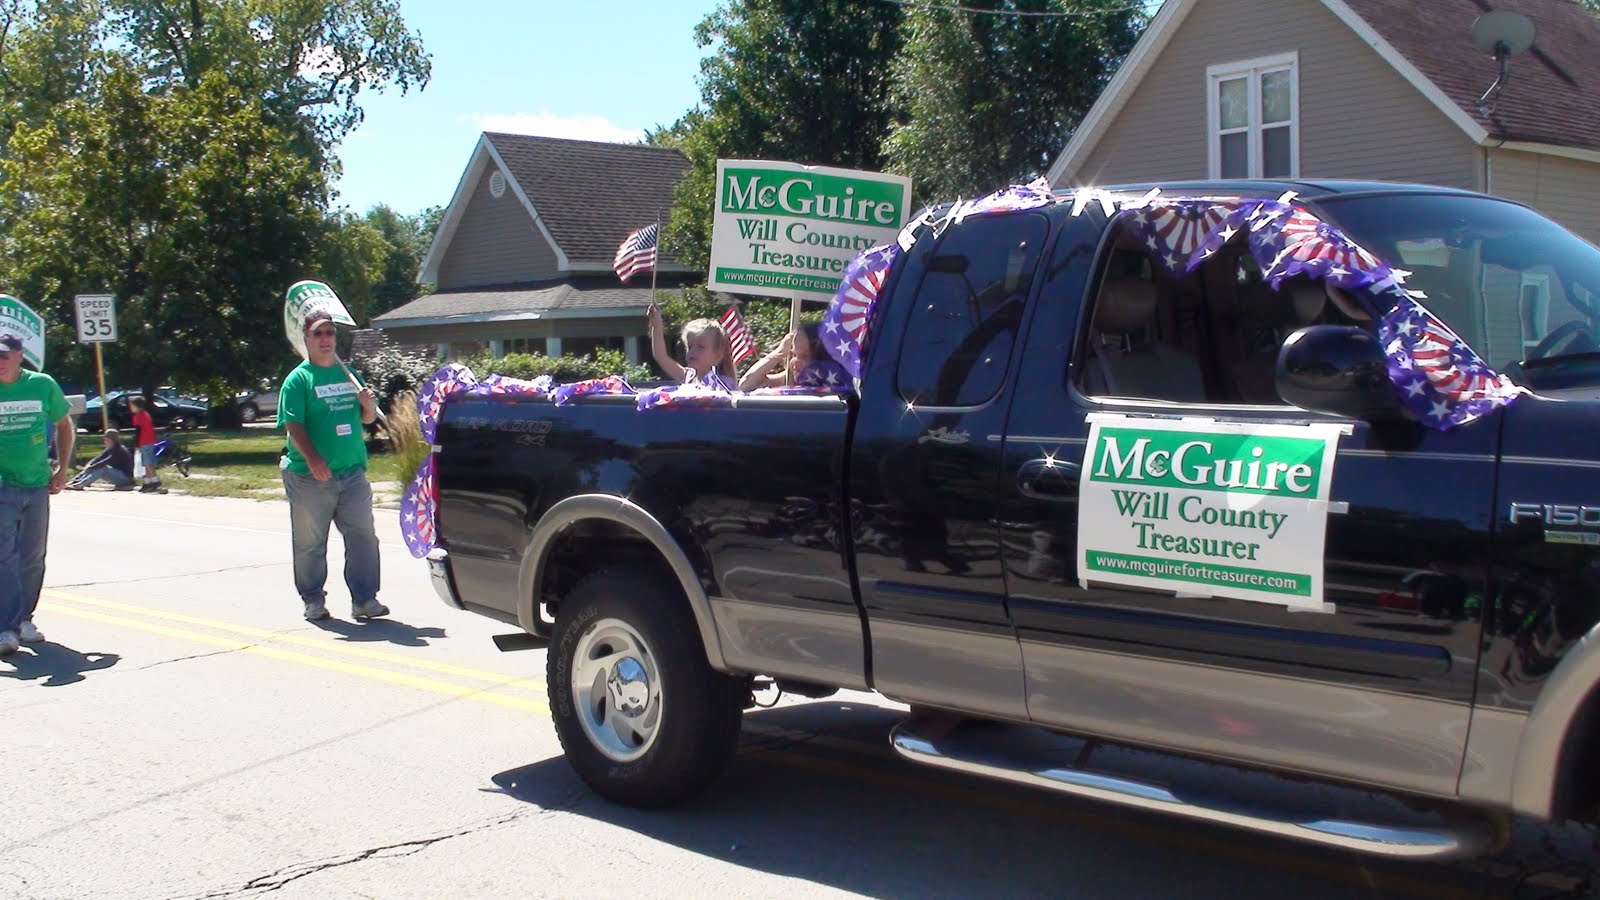 Illinois will county manhattan - Will County Treasurer Pat Mcguire S Entry In The Manhattan Illinois Fun Days Parade